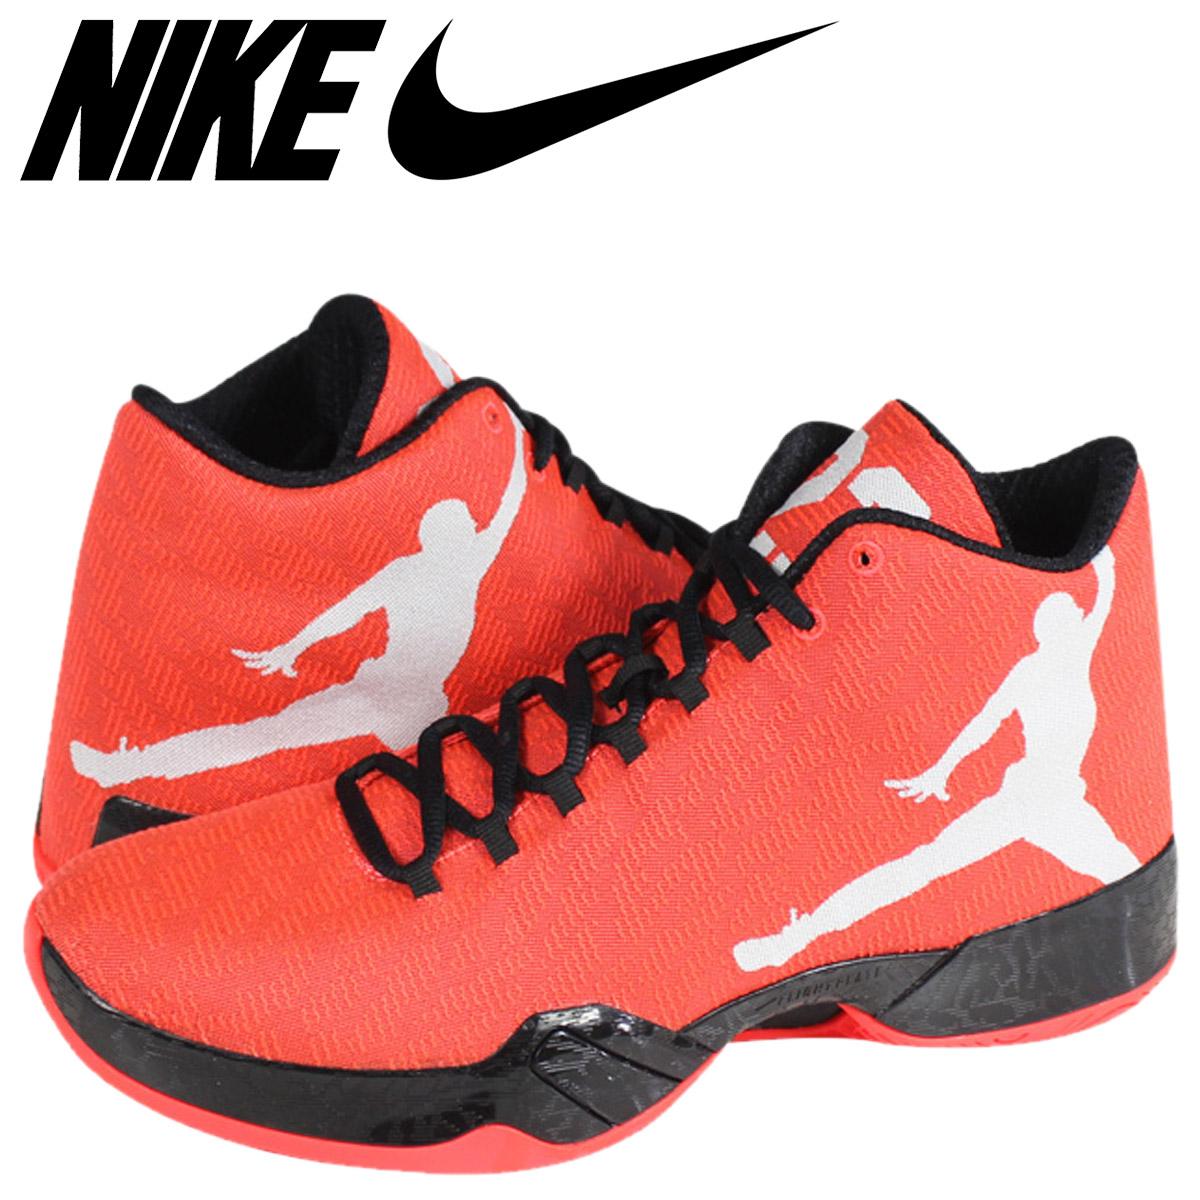 best website 64174 2719d Nike NIKE Air Jordan sneakers AIR JORDAN XX9 Air Jordan 29 695515-623 red  mens